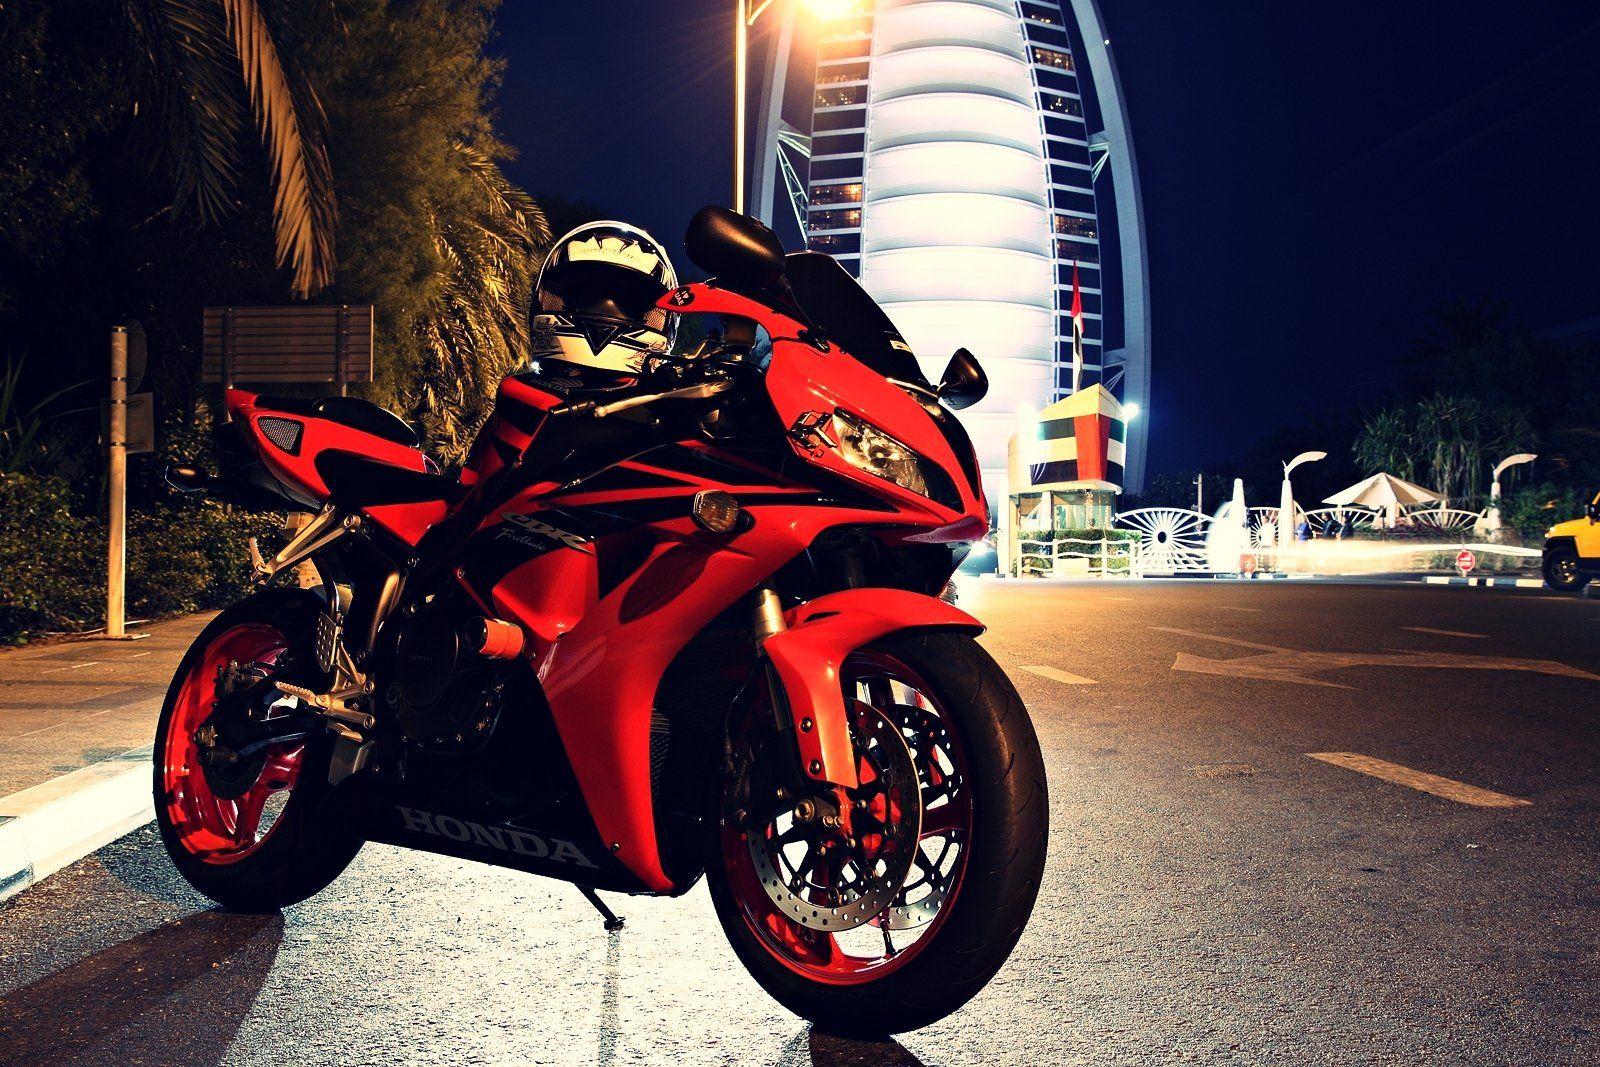 My Bike At The Burj Al Arab Dubai My Second Home Burj Al